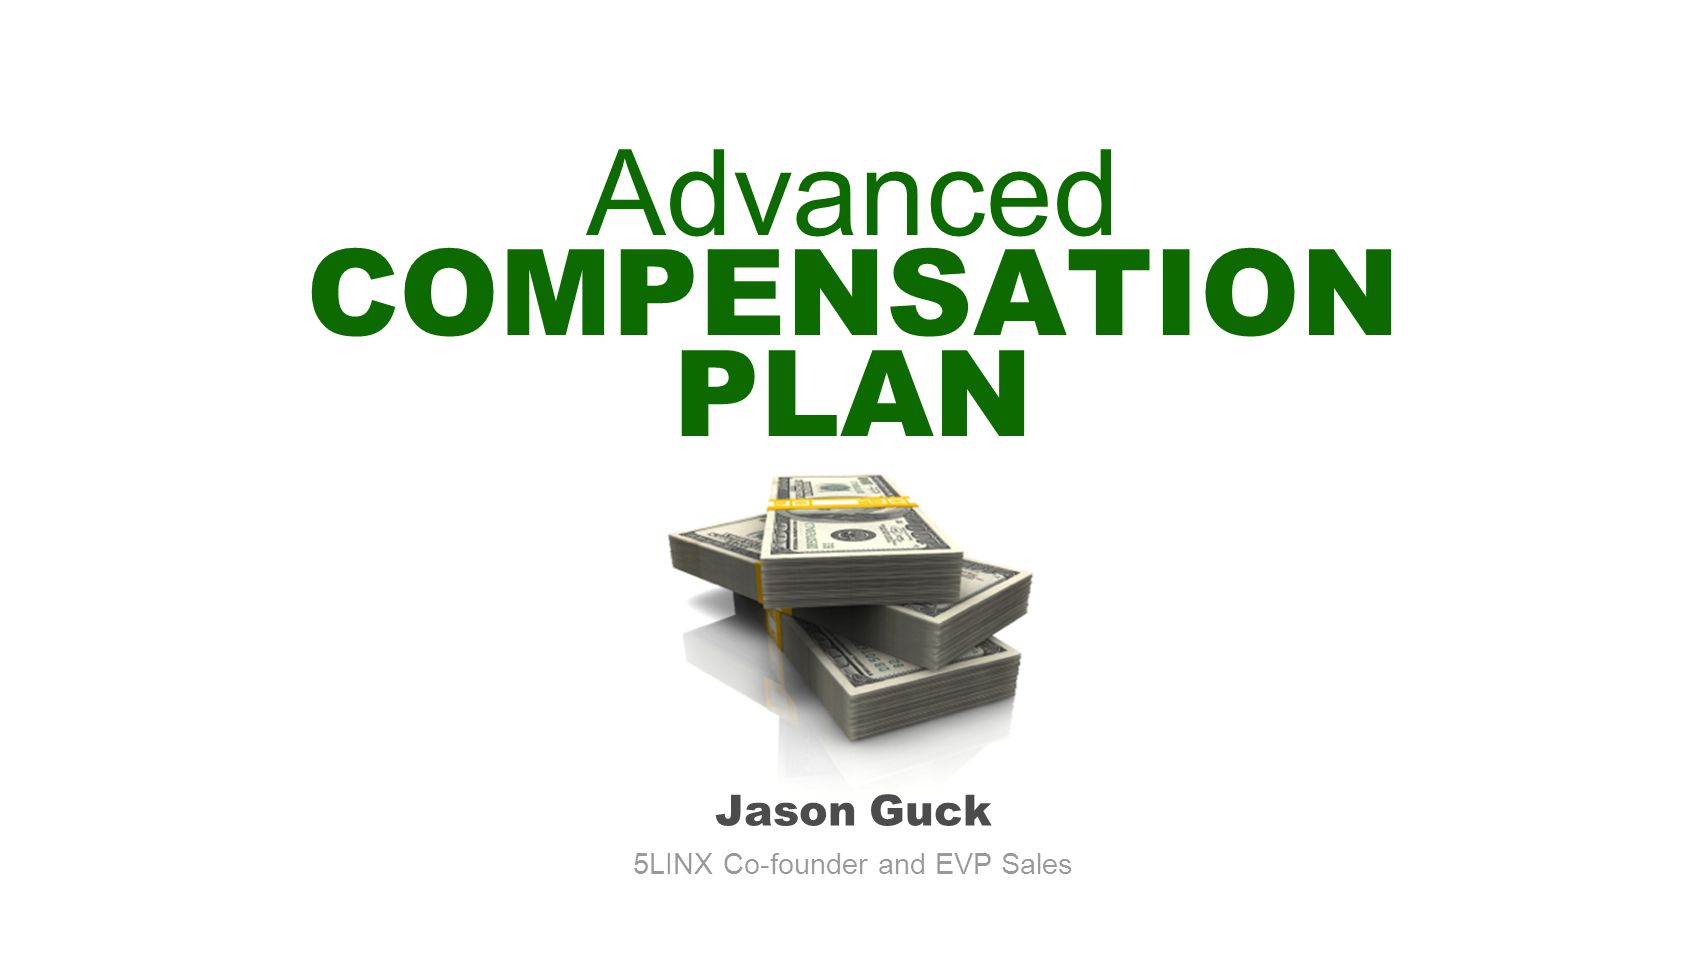 Advanced COMPENSATION PLAN